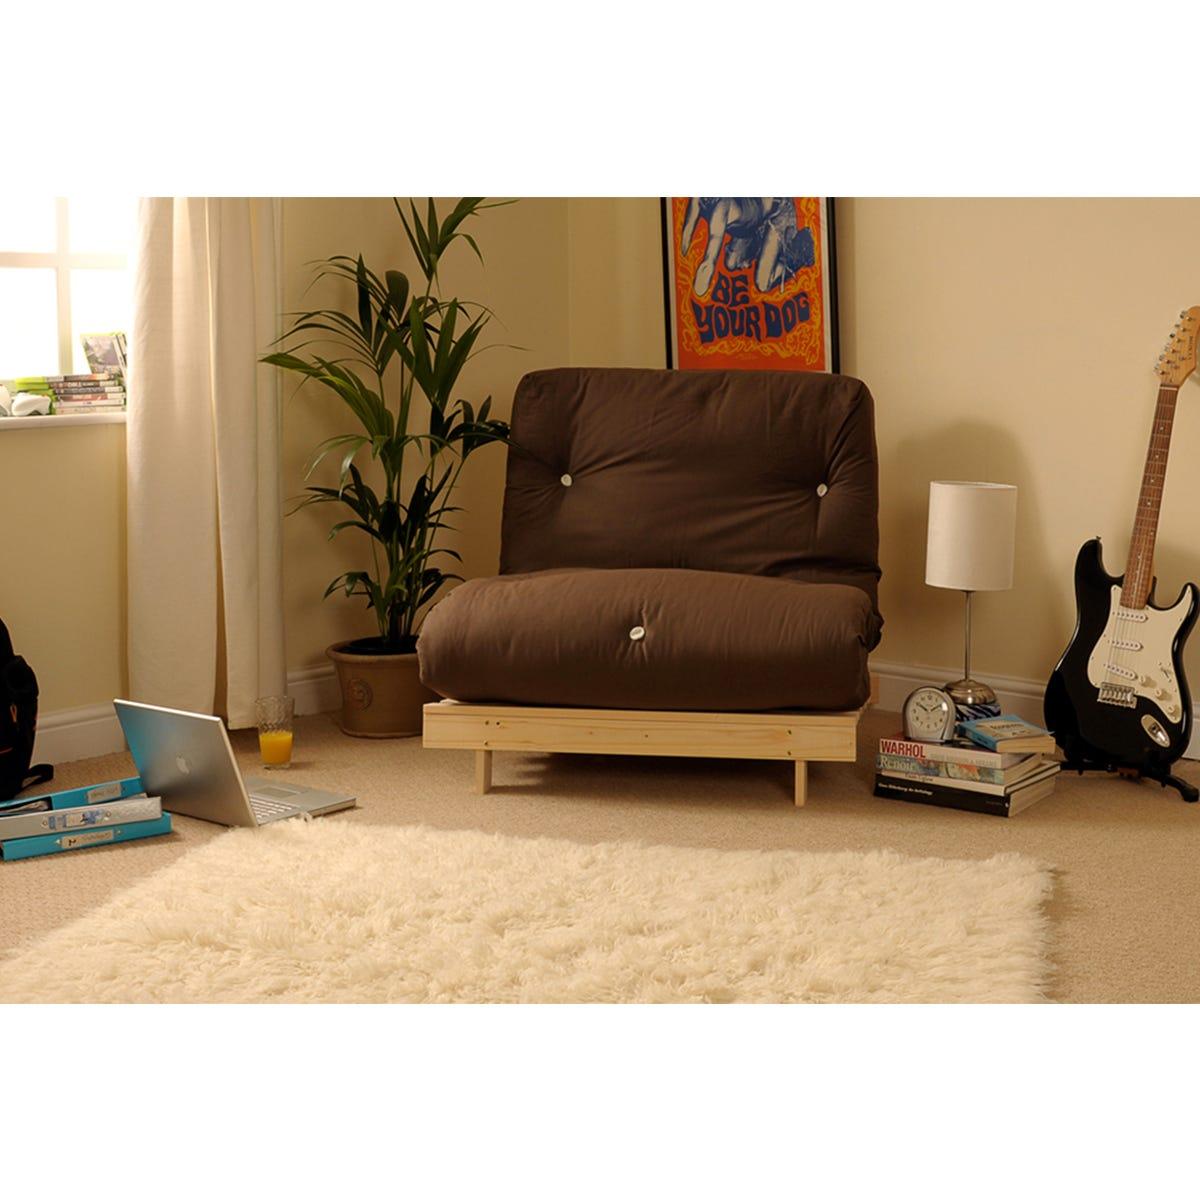 SleepOn Albury Small Double Sofa Bed Set With Tufted Mattress - Cream-Chocolate